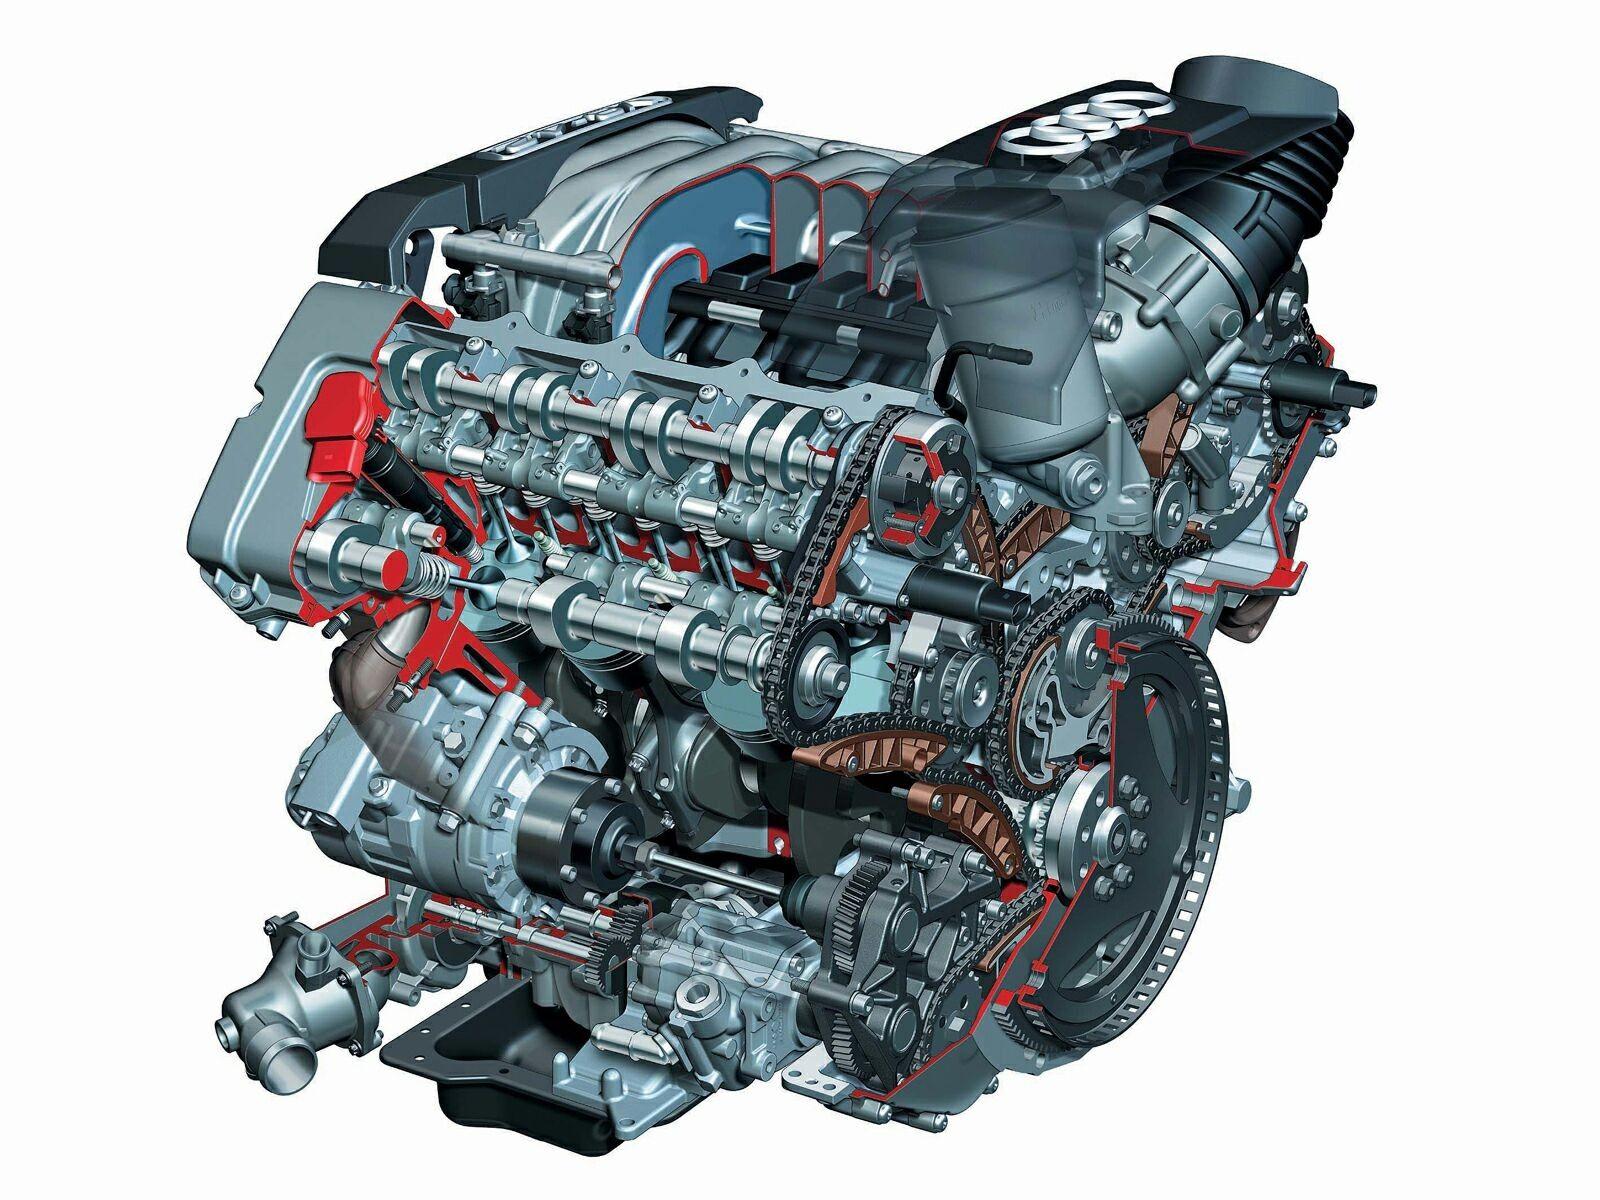 Audi Cars Engines Motor Wallpaper 1079140 Wallbase Cc Audi Audi S4 Audi A8